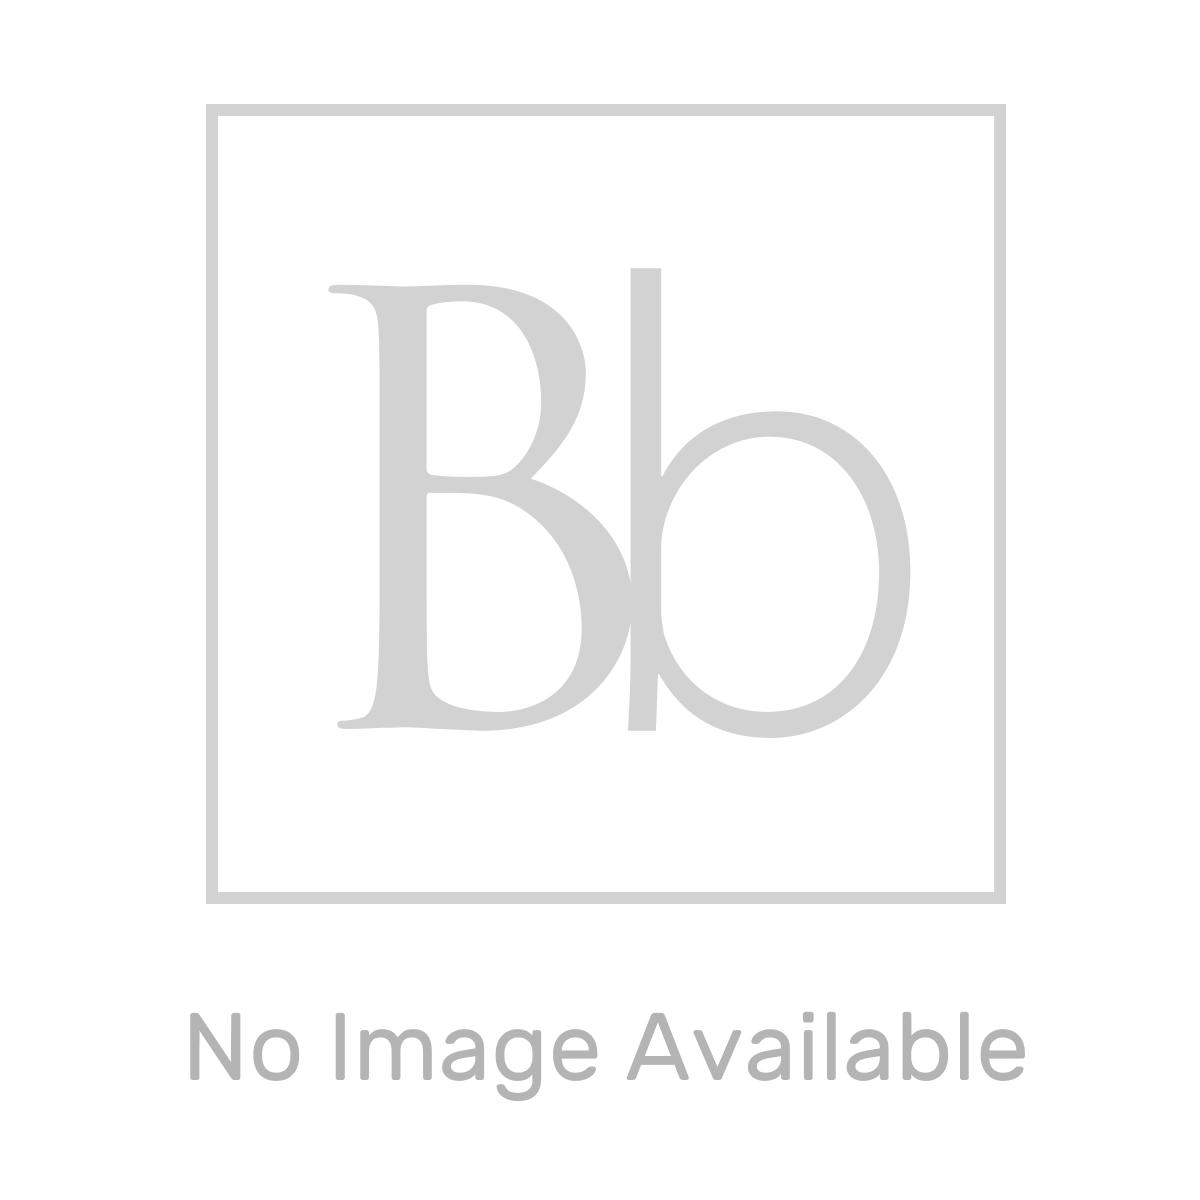 RAK Precious Travertino Ivory Wall Hung Counter Basin 1200mm with Brackets Measurements